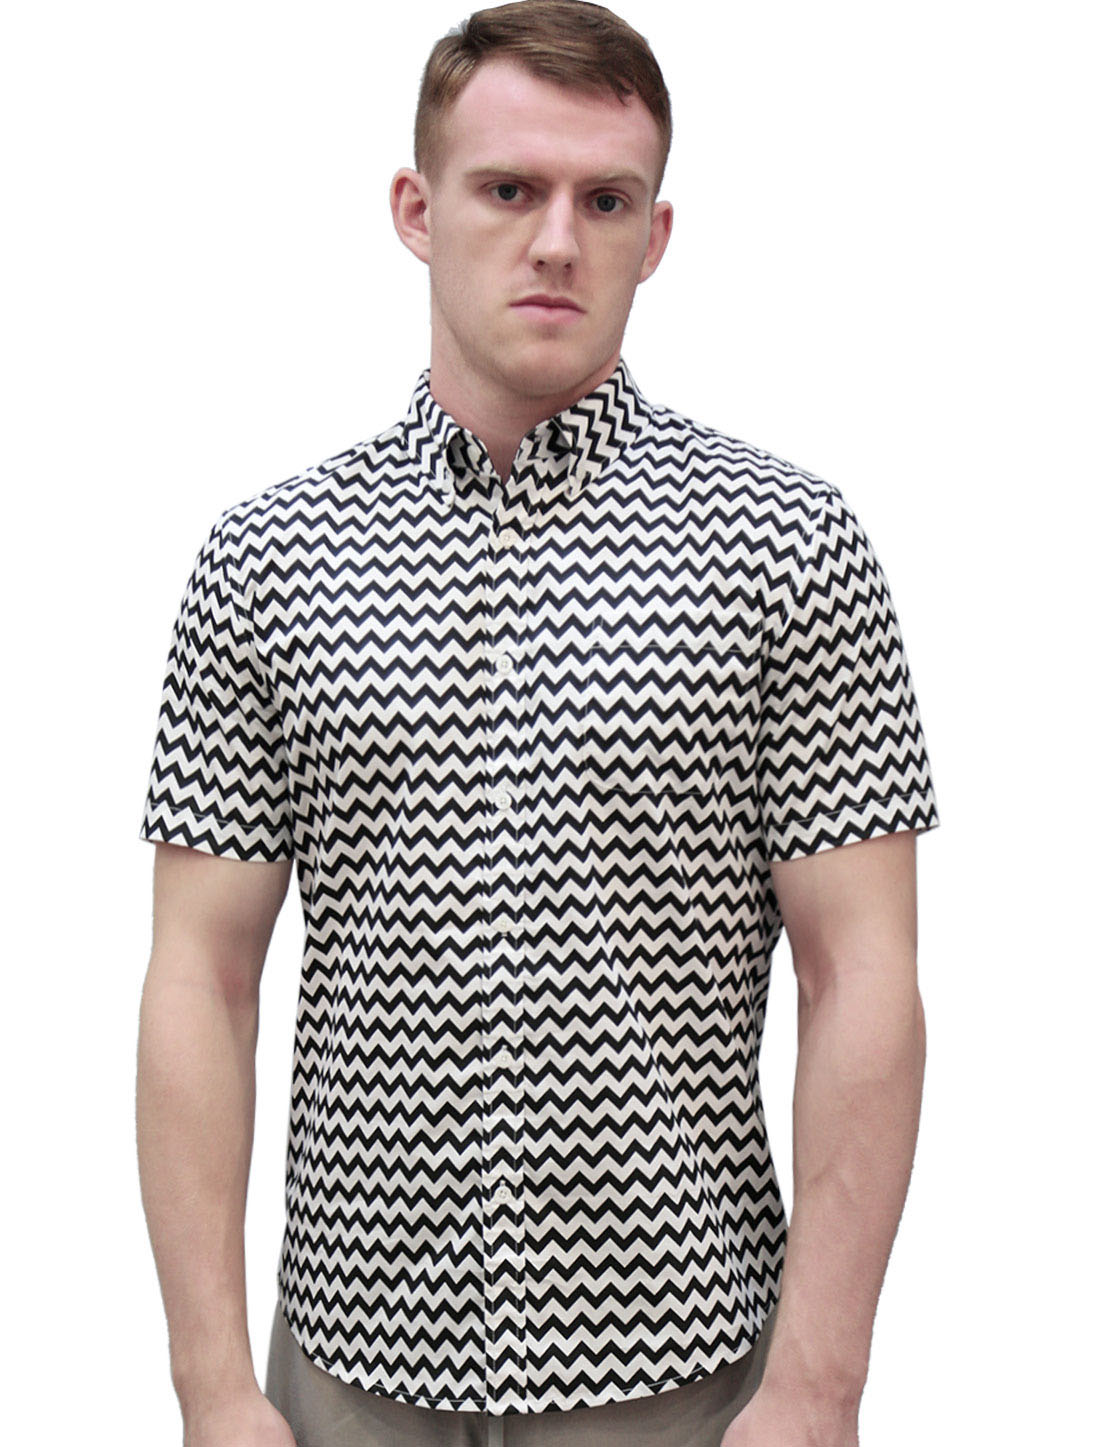 Men Zigzag Print Short Sleeves Button Down Shirt Black White M